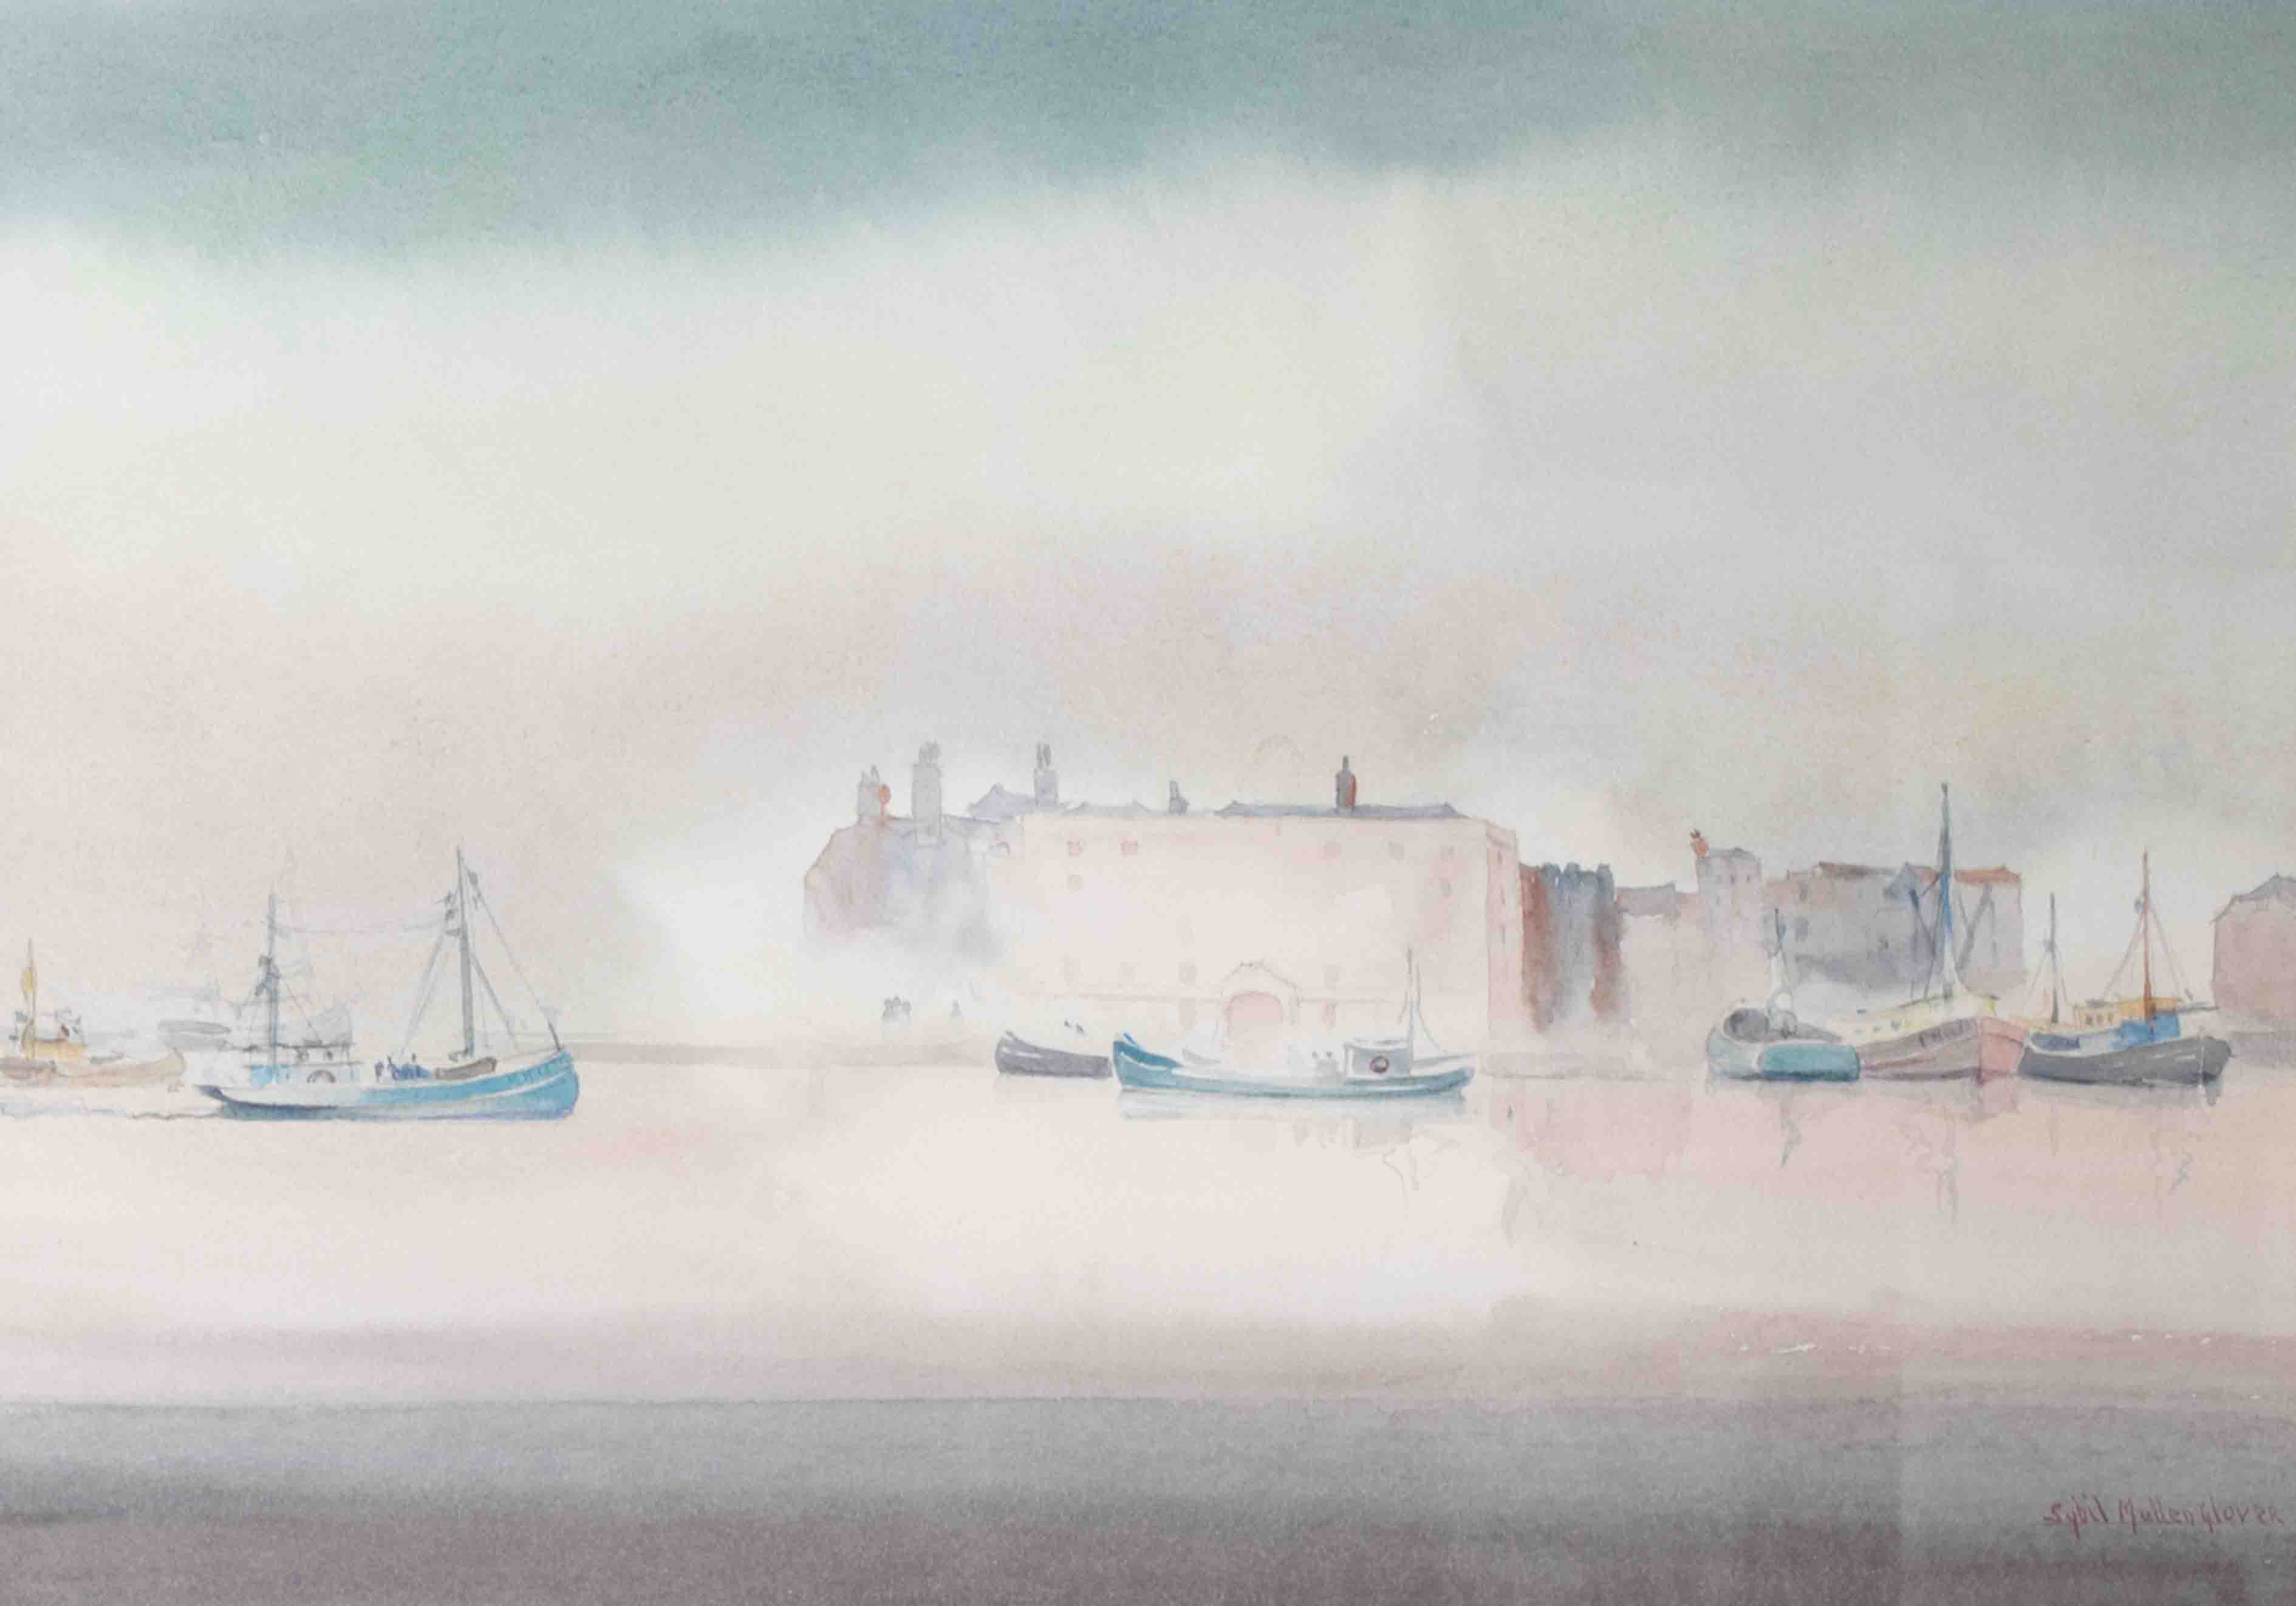 Sybil Mullen Glover RI RWA RSMA (1908-1995), 'Boats, Plymouth' signed watercolour, 25cm x 35cm, - Image 2 of 2